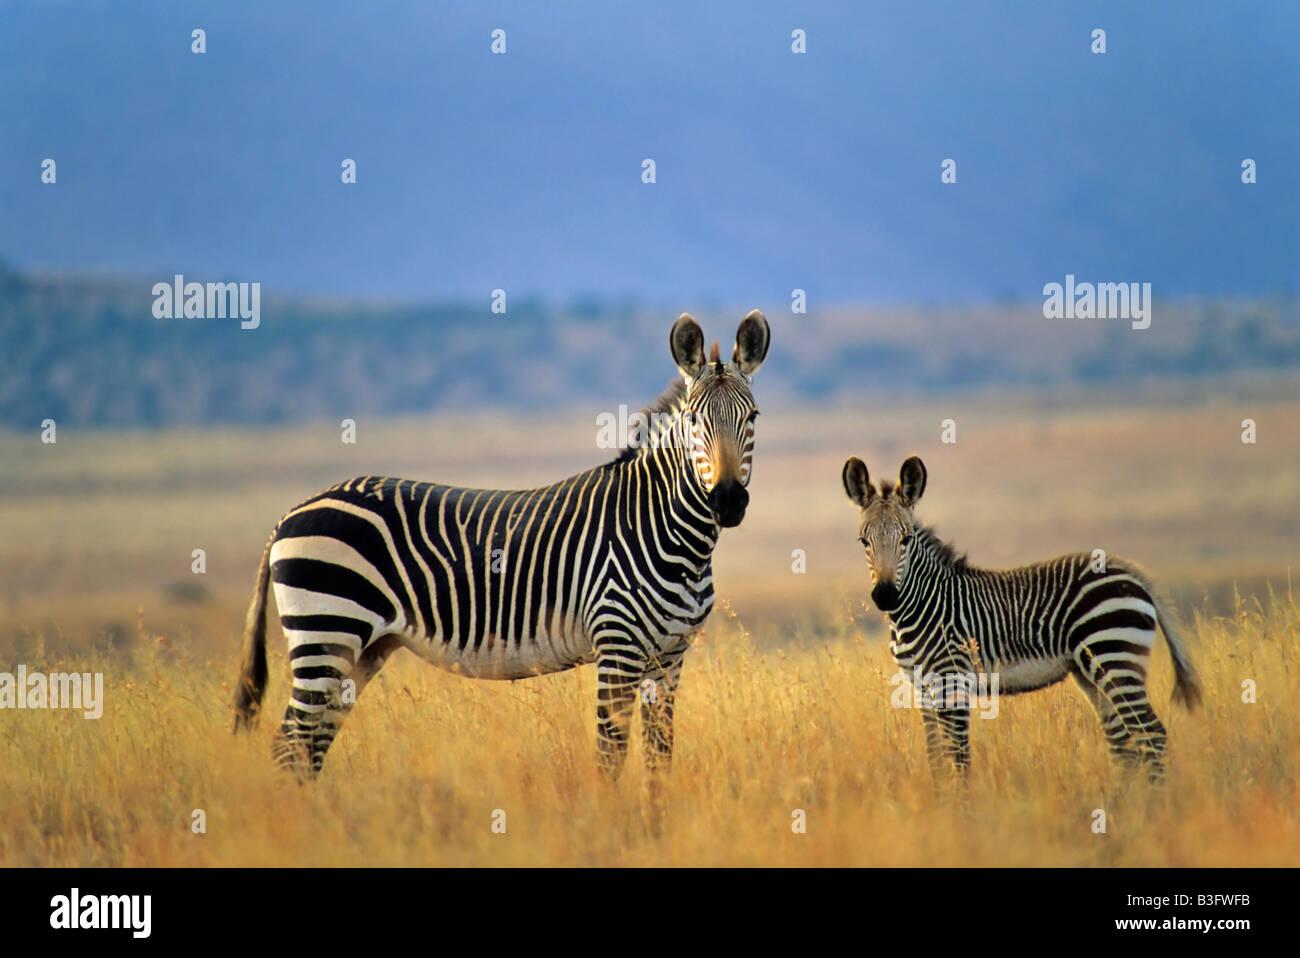 Zebra Poster Stock Photos Amp Zebra Poster Stock Images